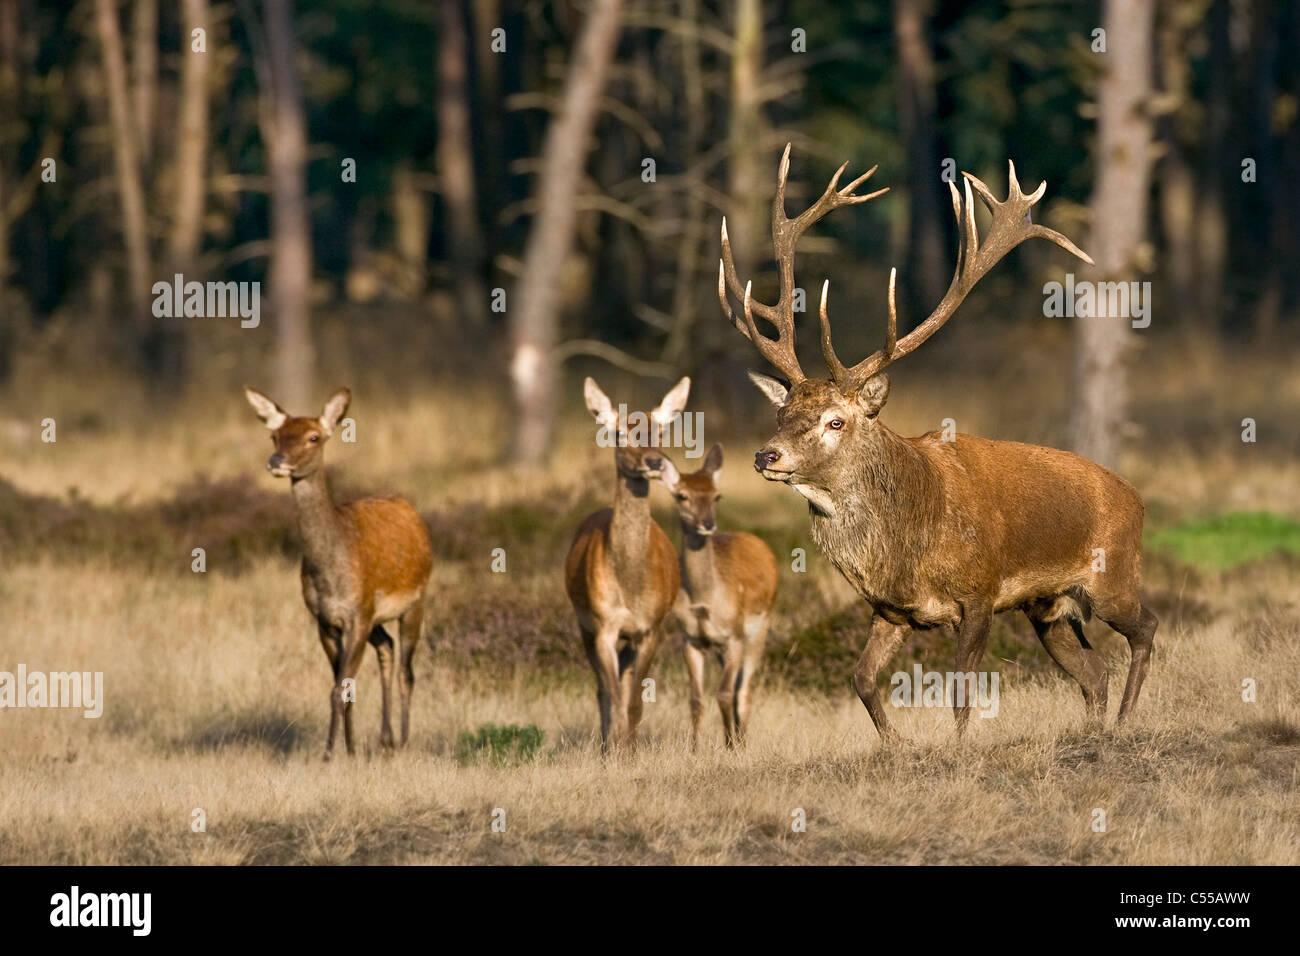 I Paesi Bassi, Otterlo, Parco Nazionale chiamato De Hoge Veluwe. Il cervo (Cervus elaphus). Immagini Stock